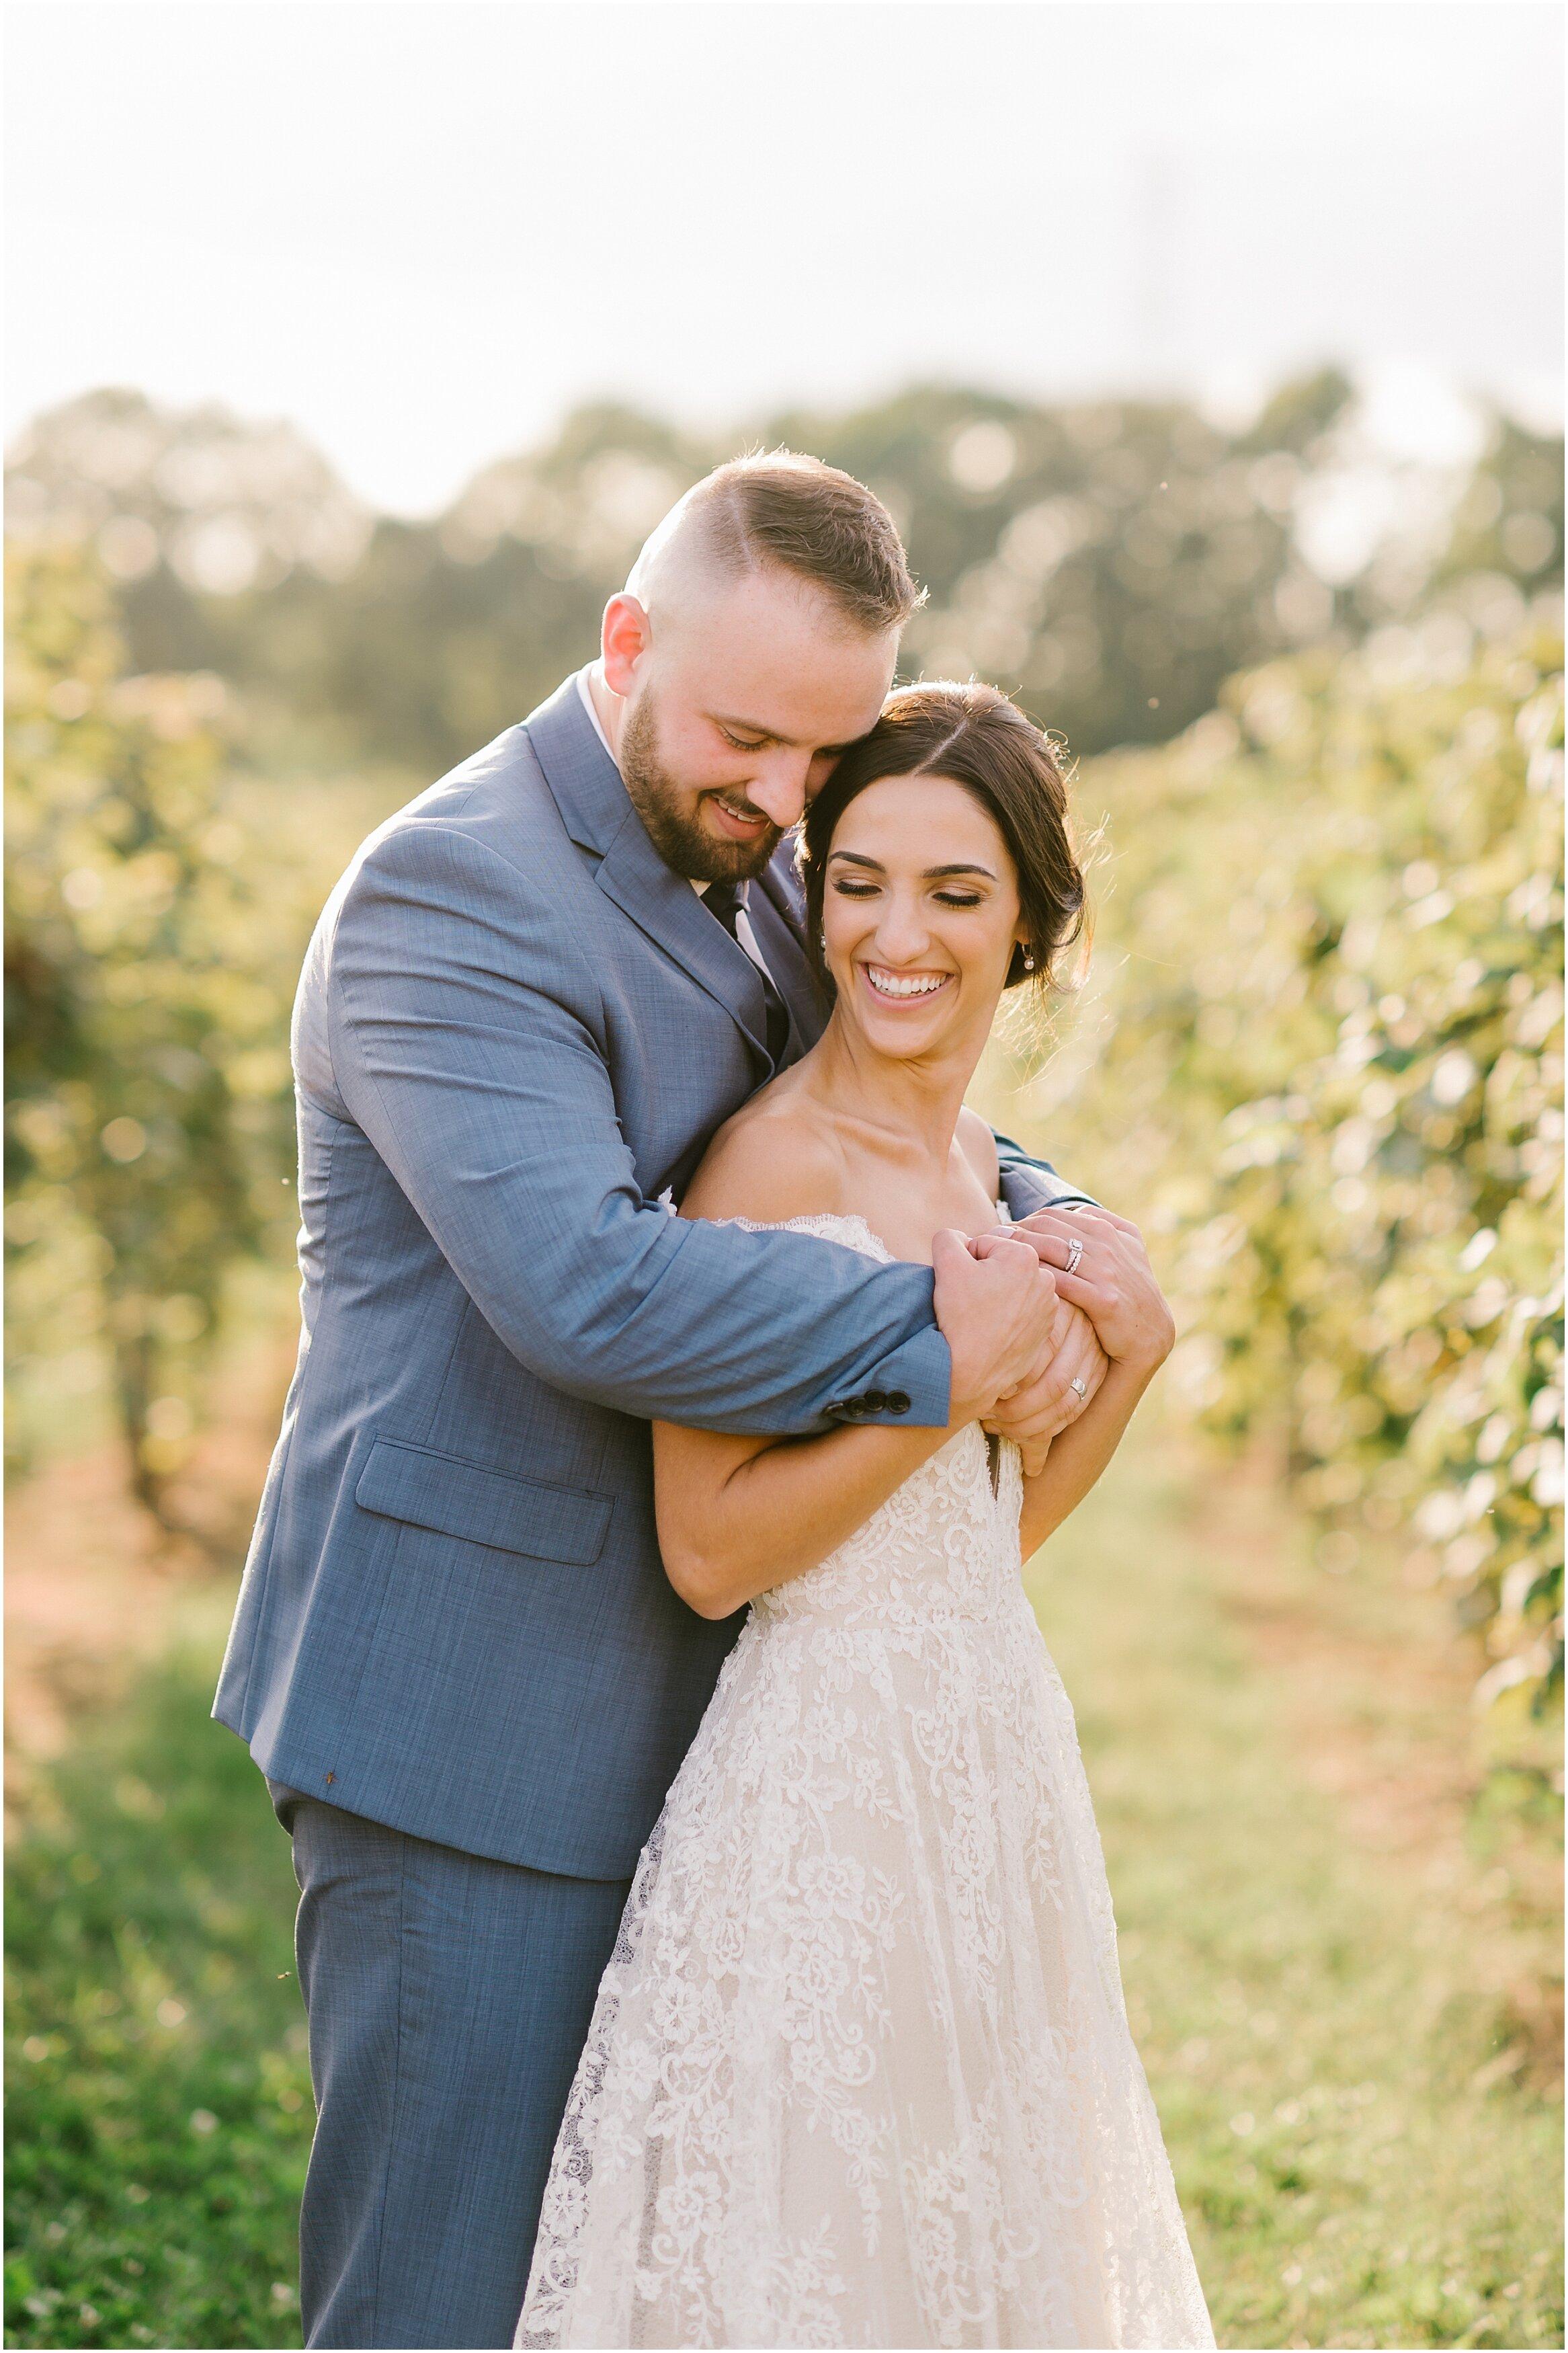 Rebecca Shehorn Photography Indianapolis Wedding Photographer Sycamore at Mallow Run_0769.jpg